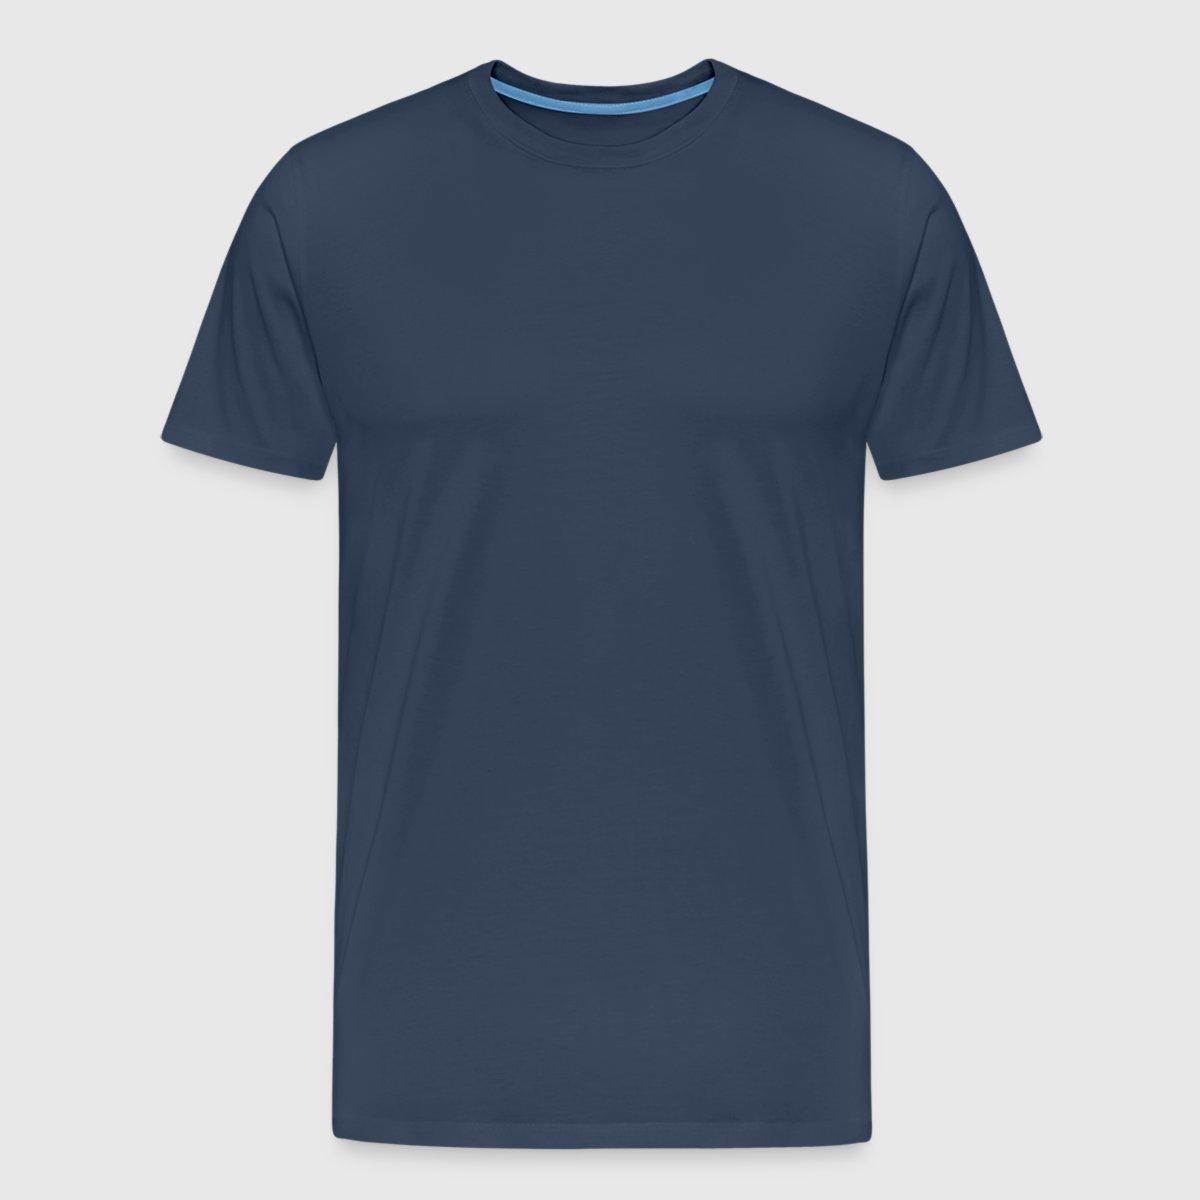 m nner premium t shirt spreadshirt. Black Bedroom Furniture Sets. Home Design Ideas